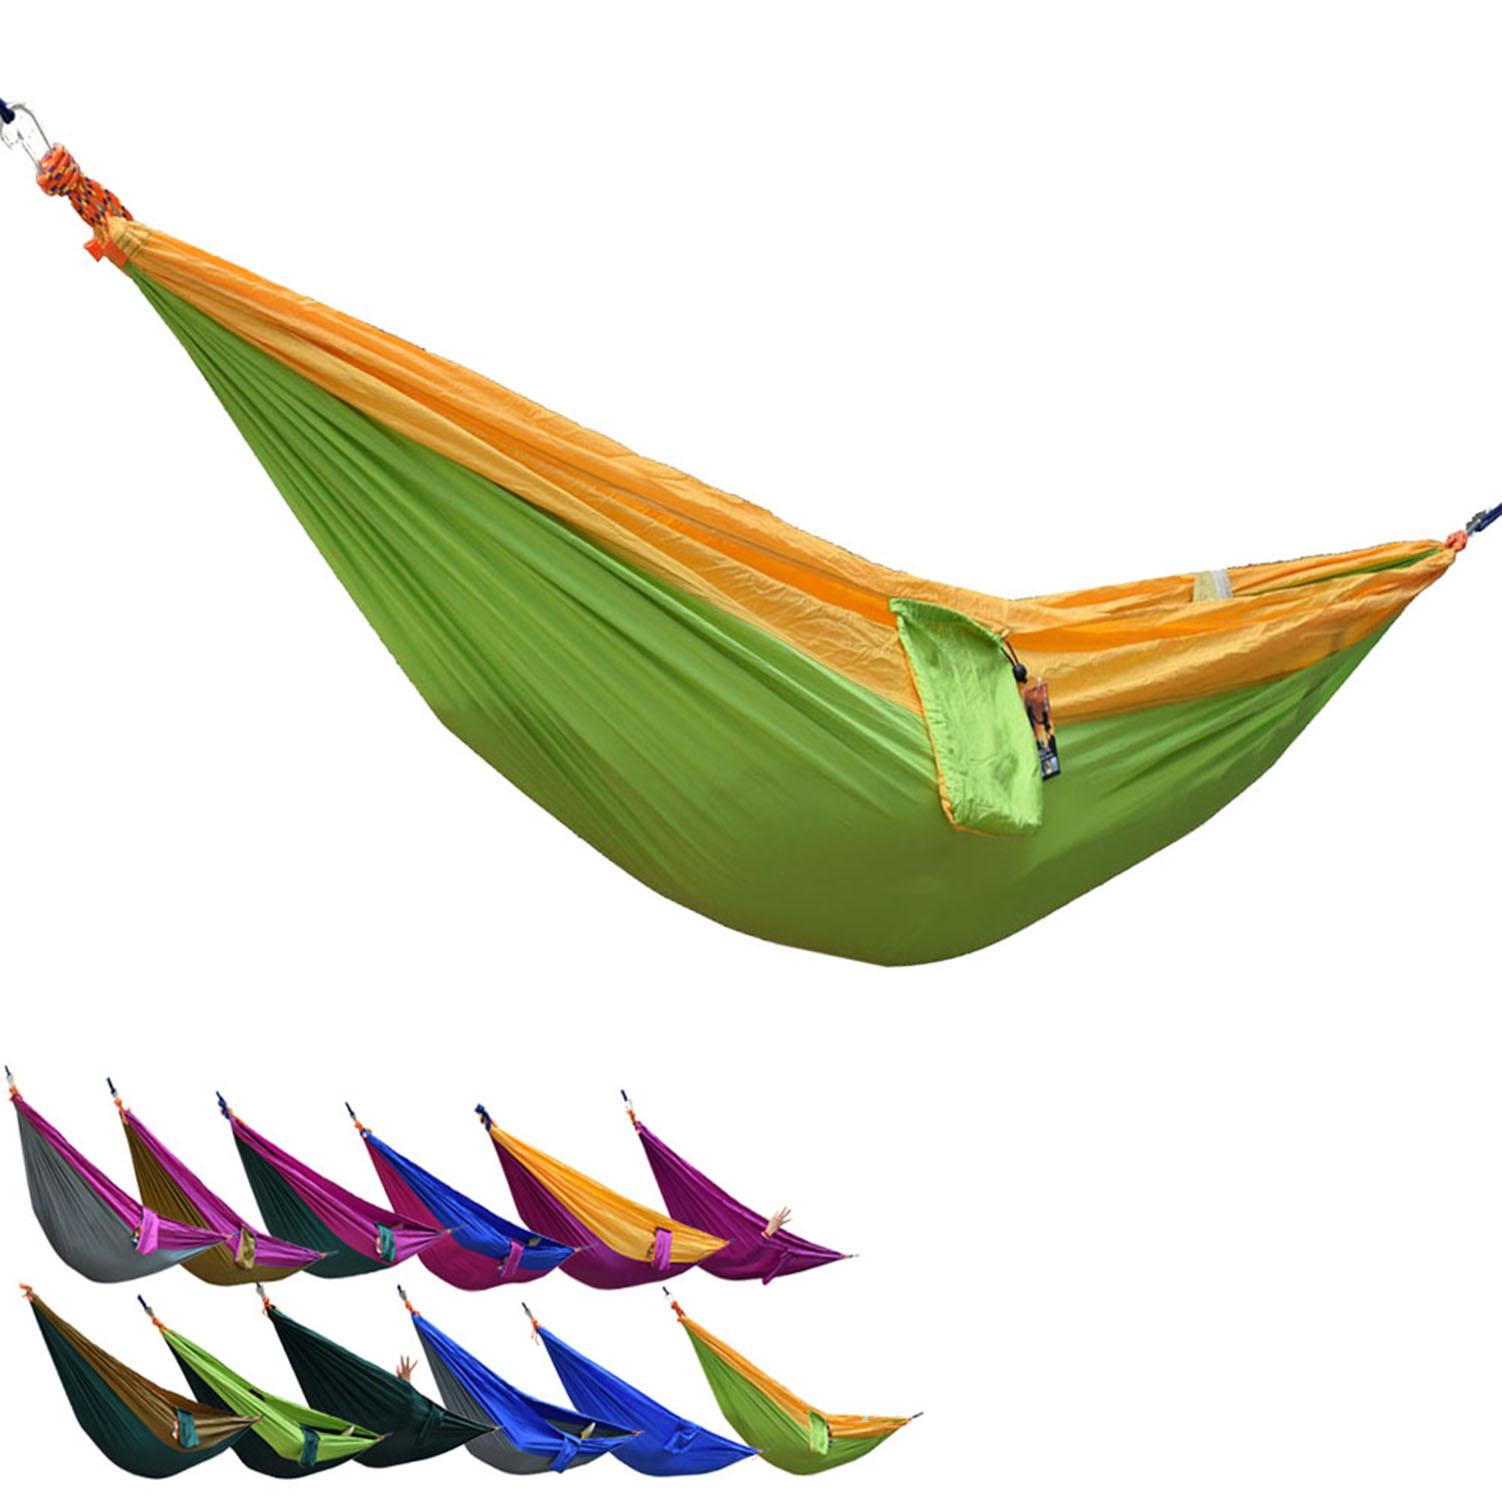 Portable Parachute Nylon Fabric Outdoor Travel Camping Hammock<br><br>Aliexpress